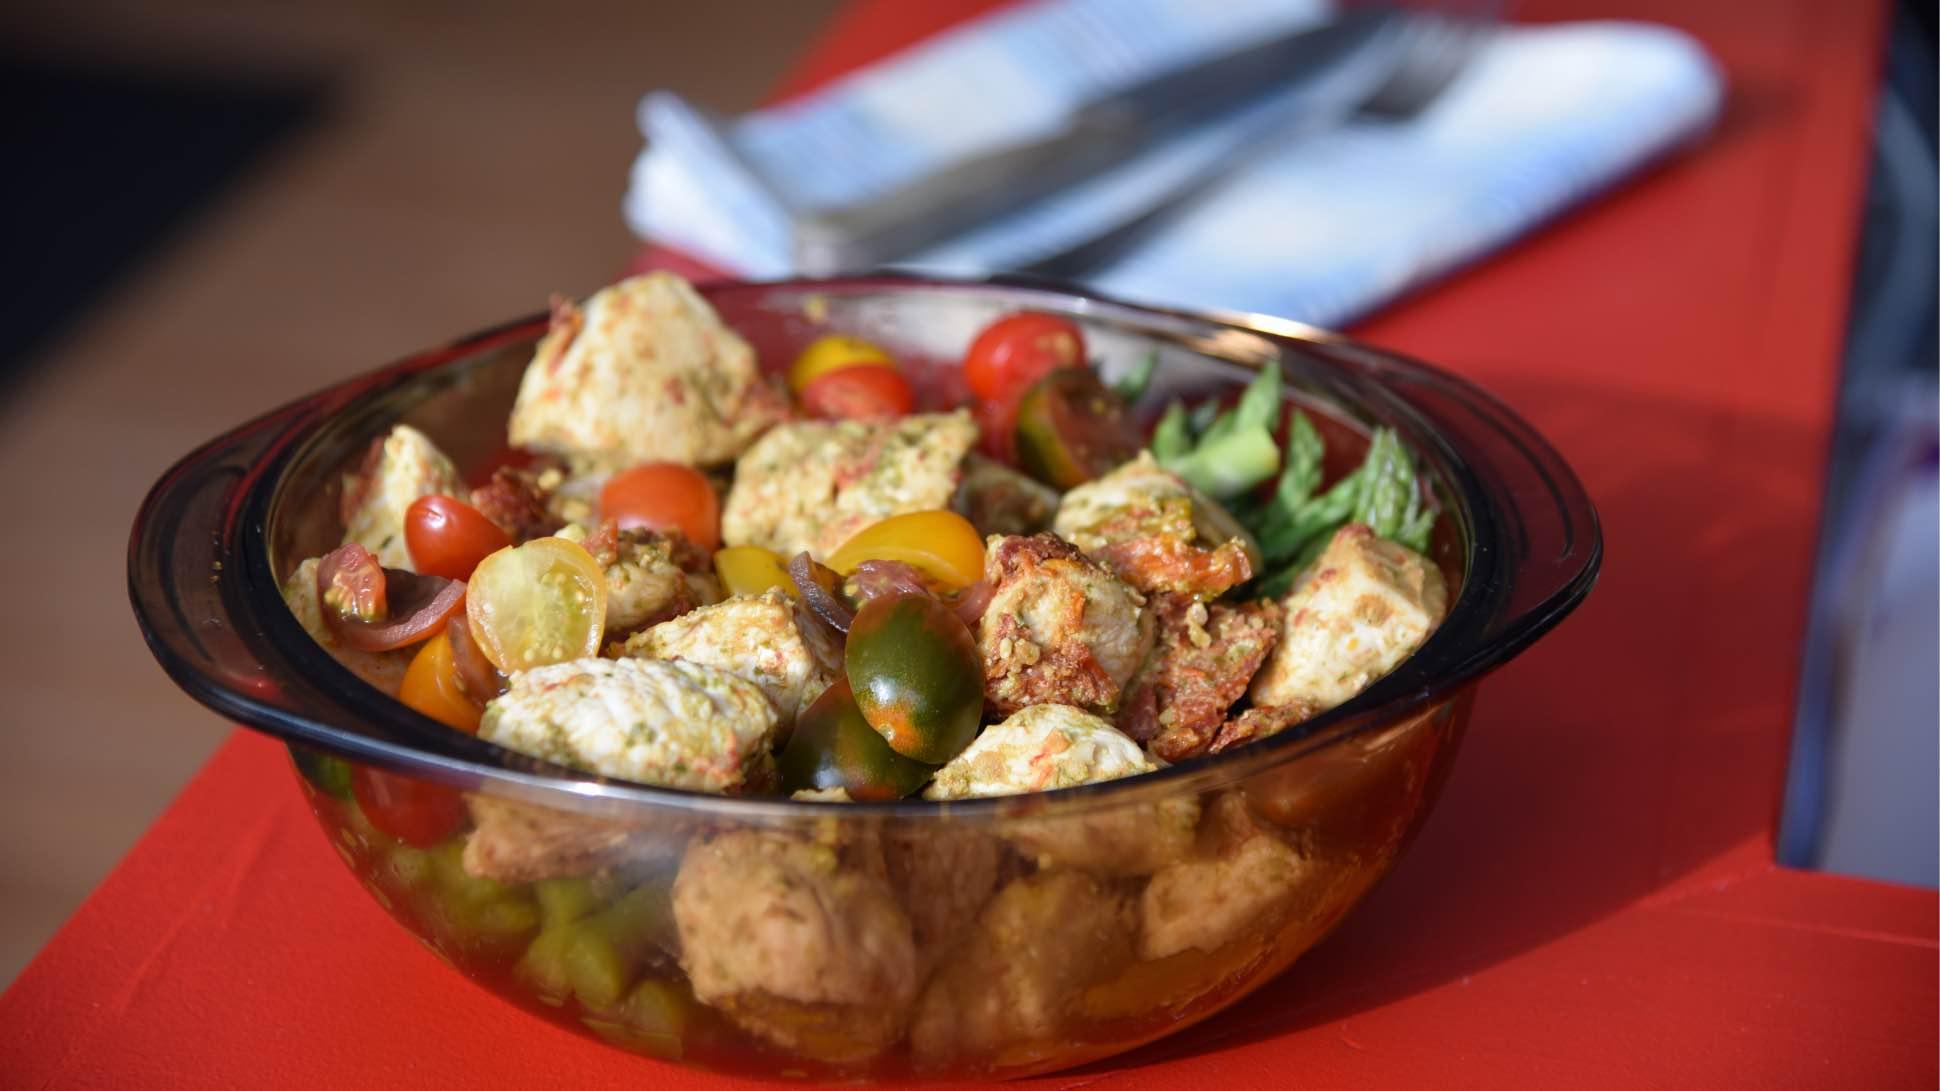 Tasty Tuesday_170110_Pesto Chicken_16x9.jpg